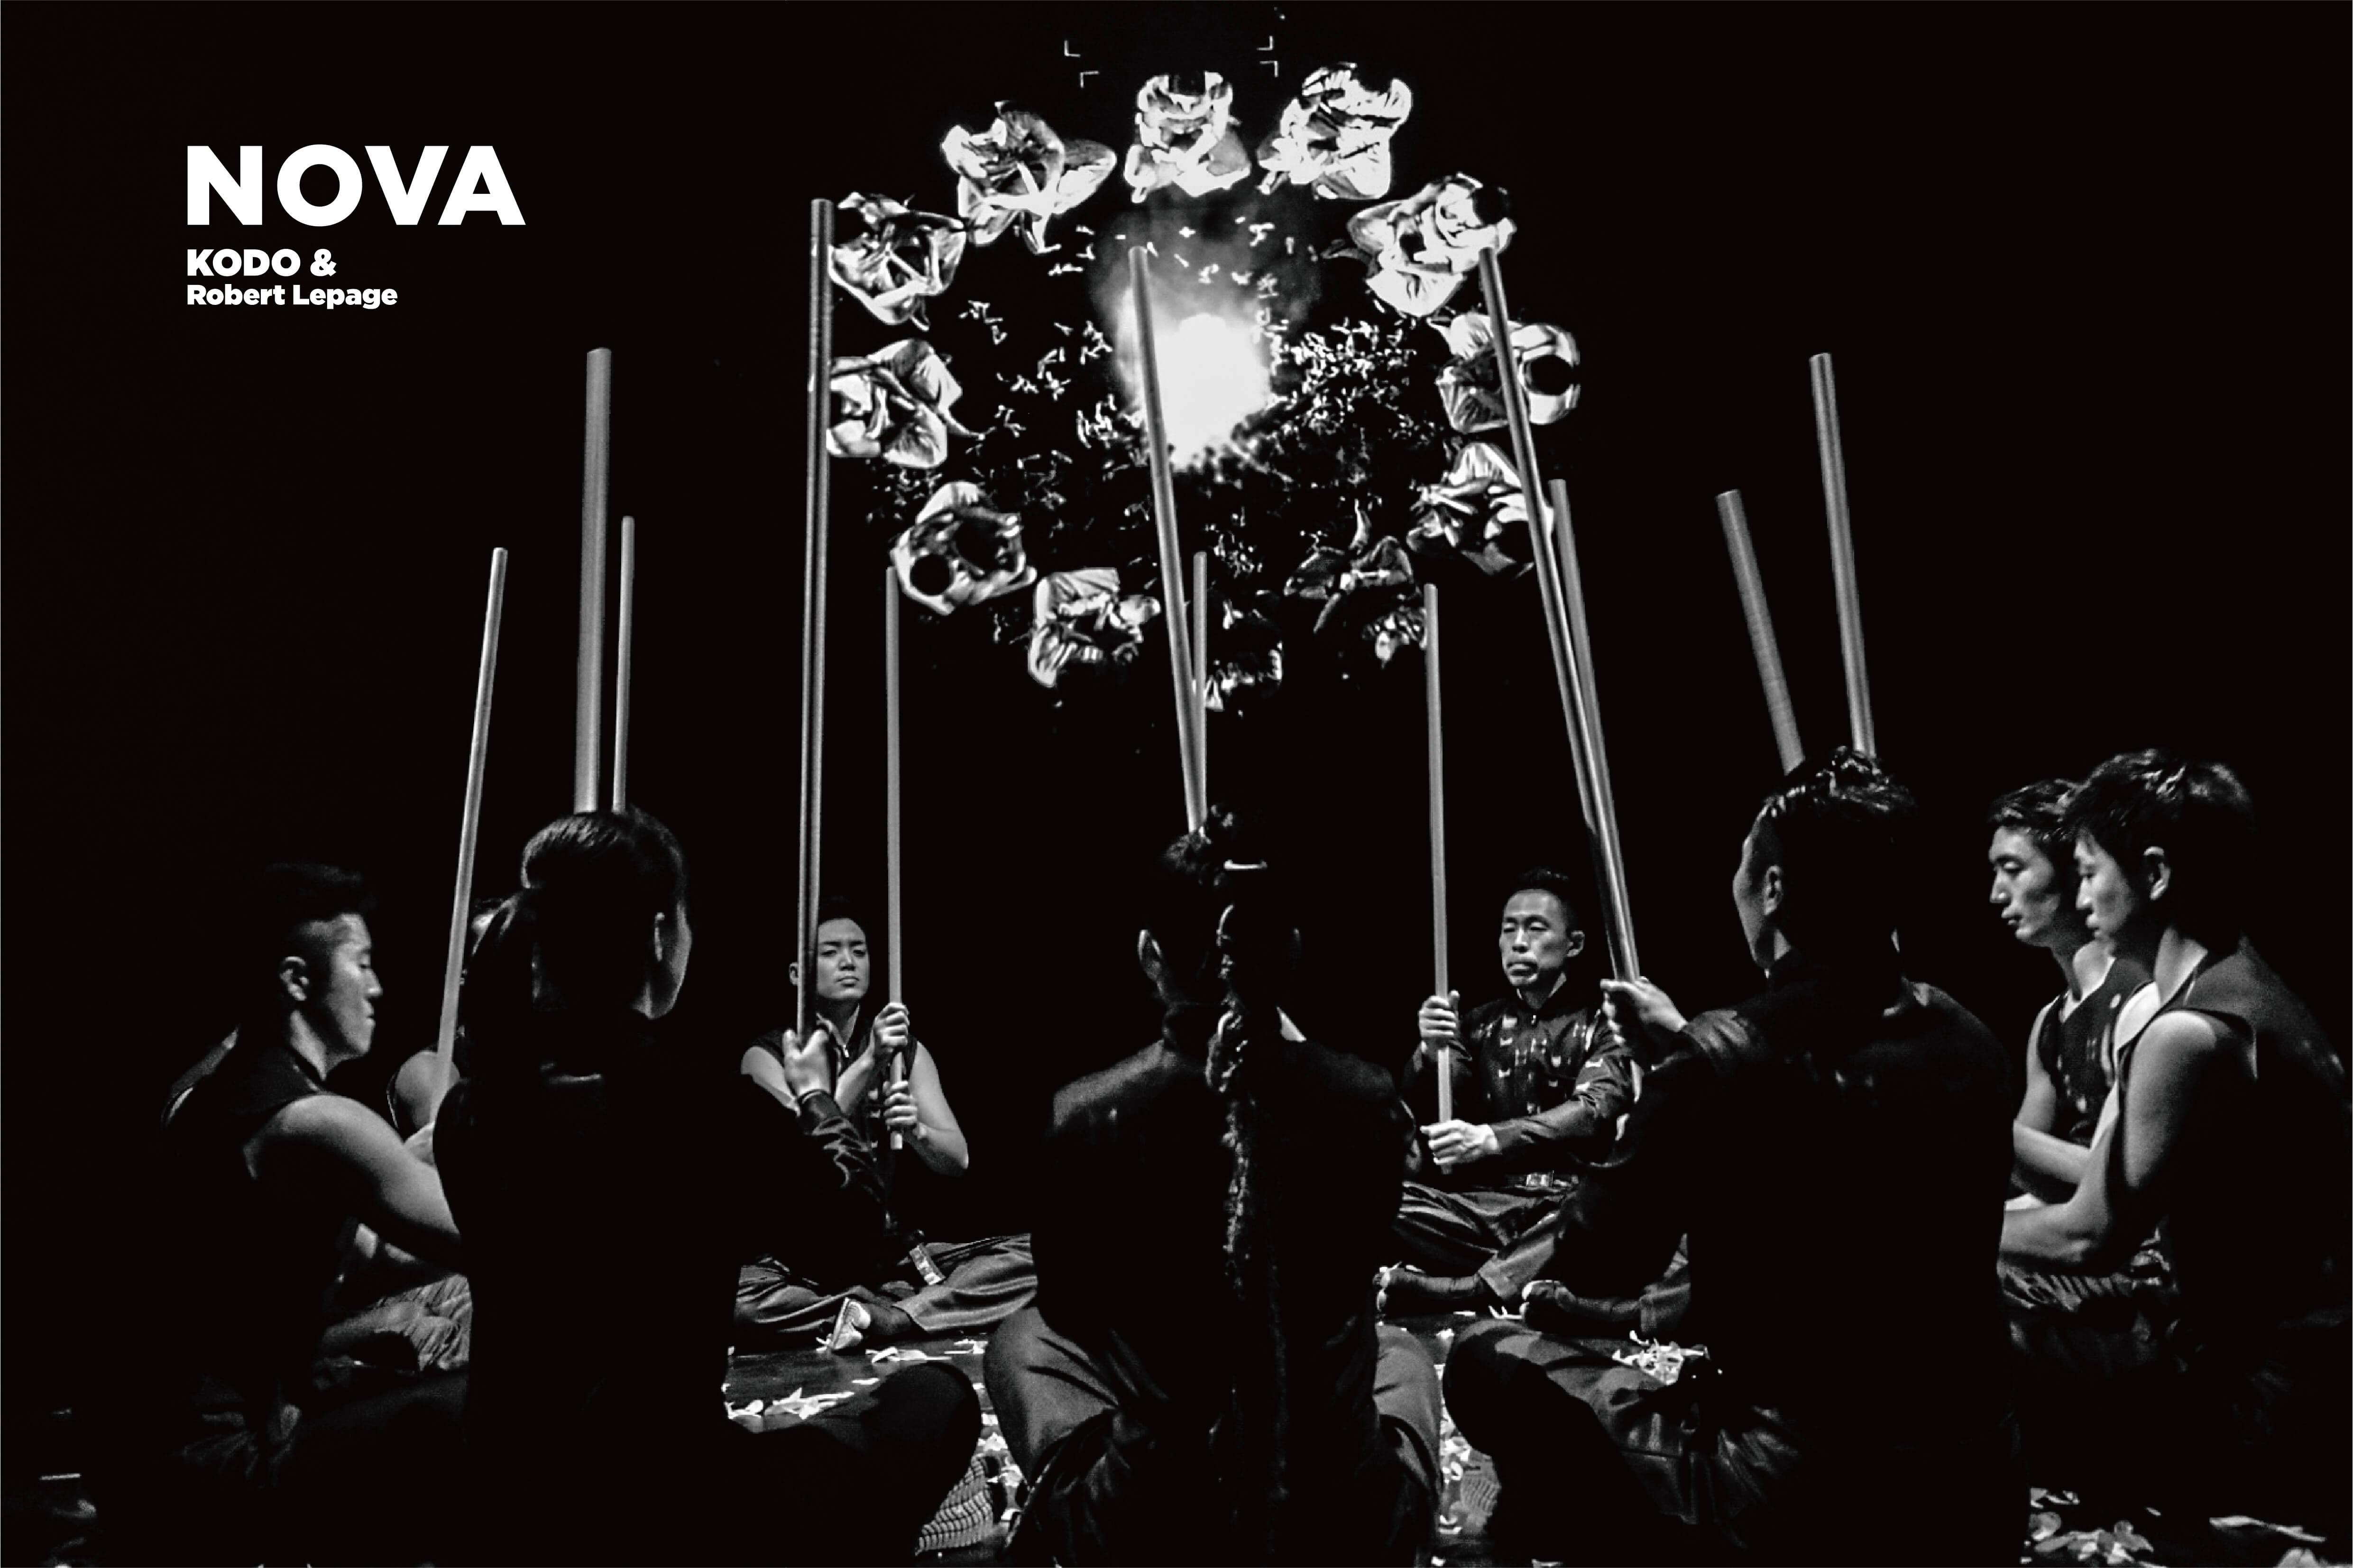 "〈NOVA〉太鼓芸能集団「鼓童」と ""映像の魔術師""ロベール・ルパージュが邂逅する新しい公演"